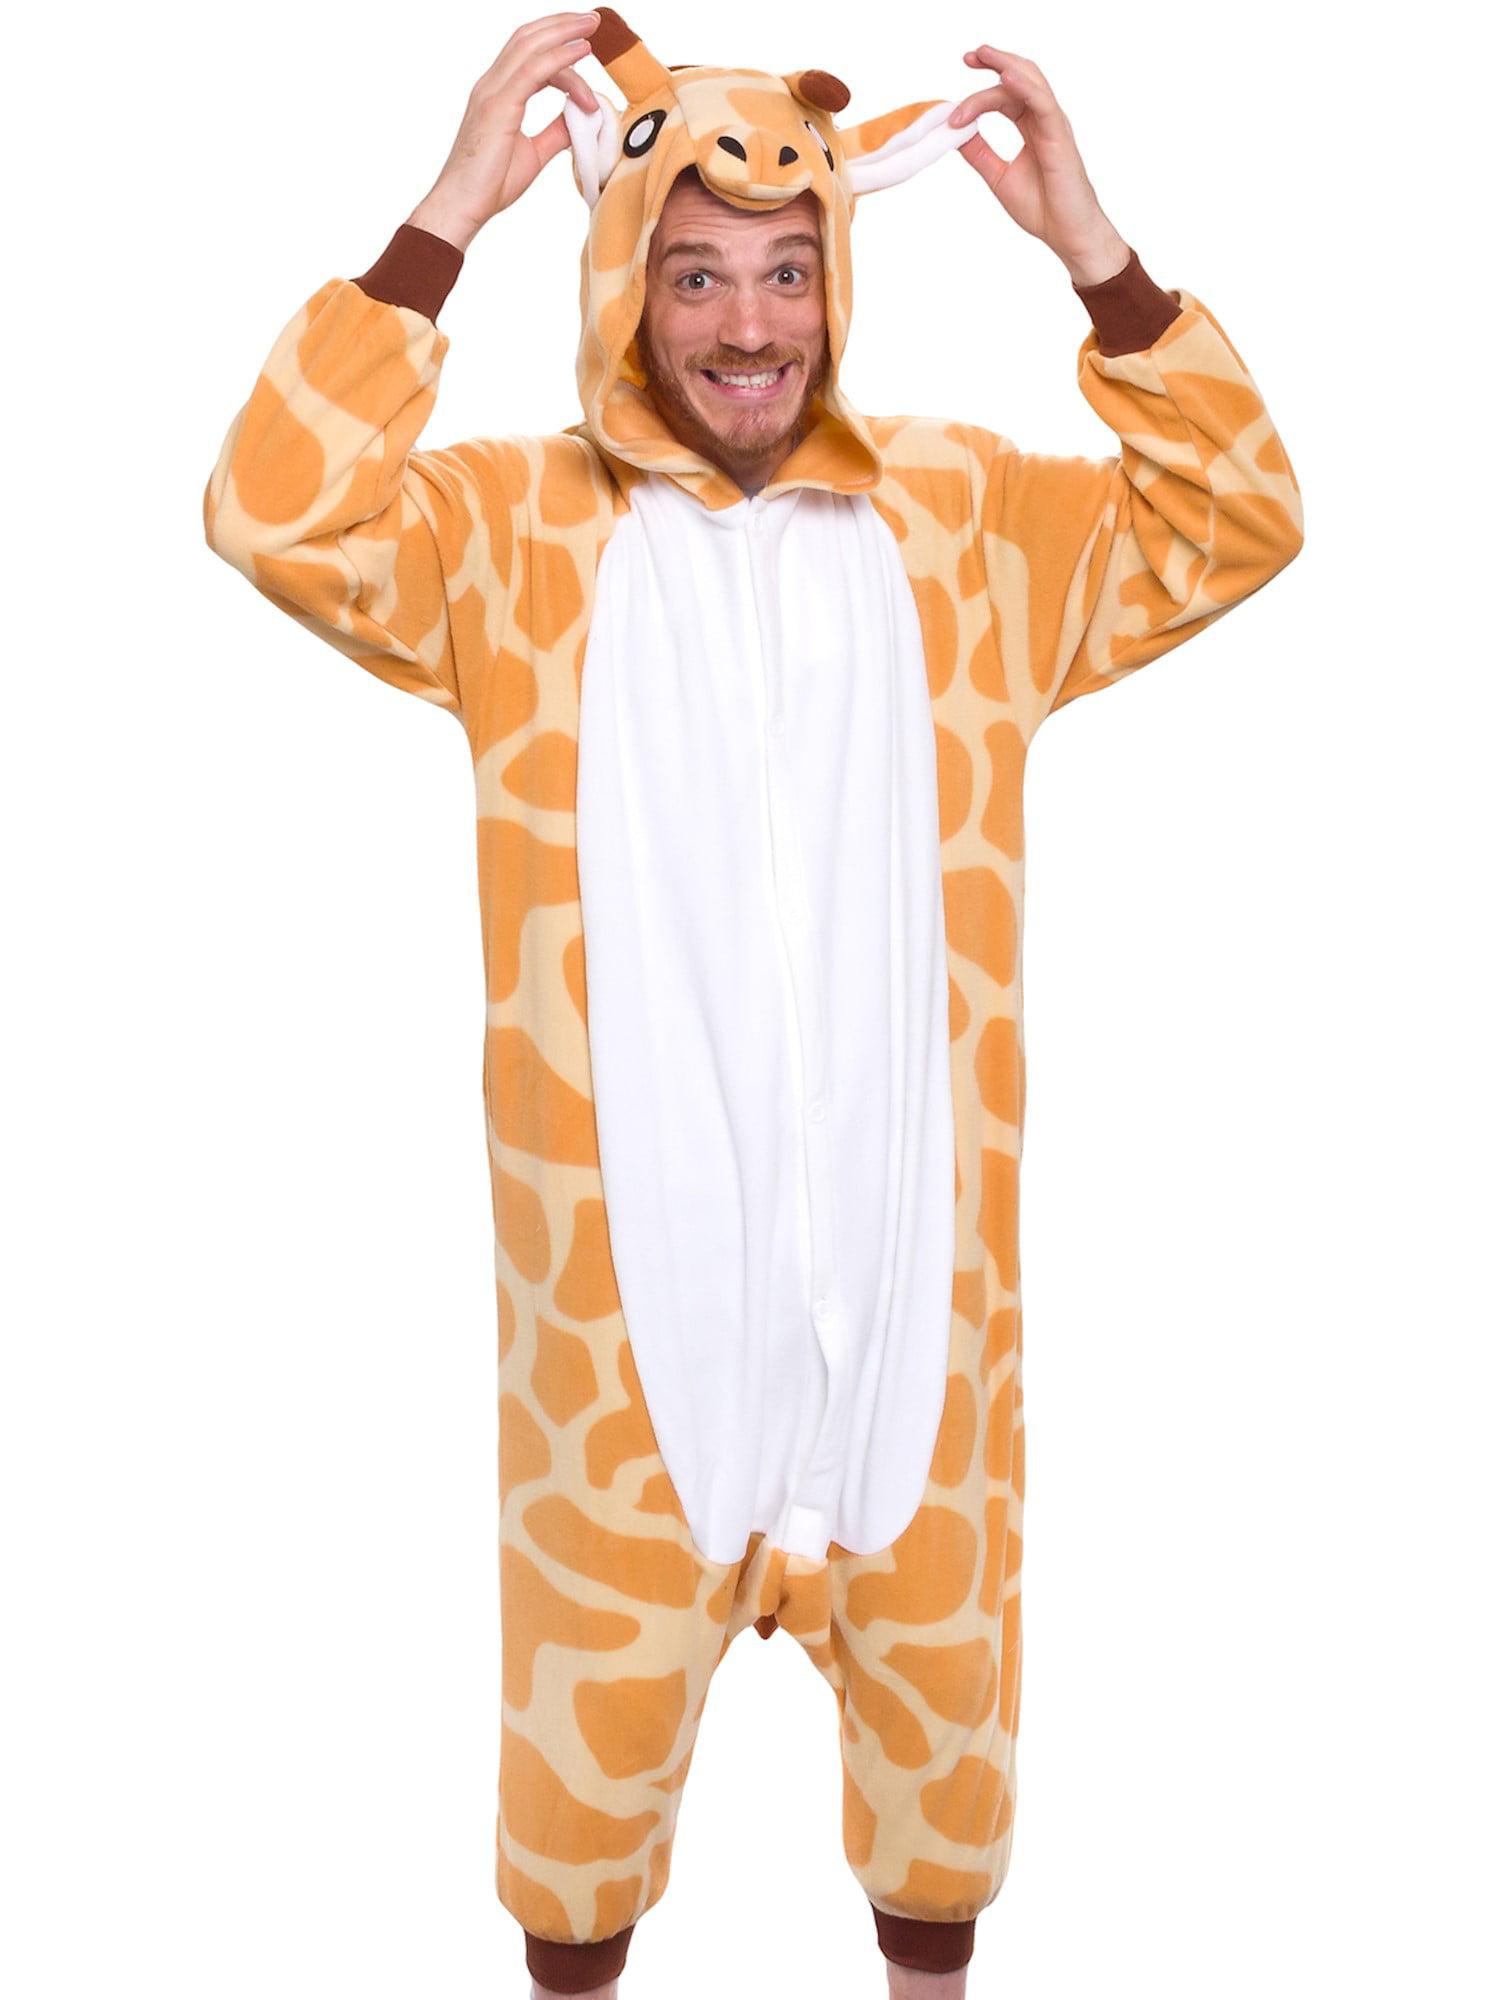 SILVER LILLY Unisex Adult Plush Animal Cosplay Costume Pajamas (Giraffe) -  Walmart.com a8f6f0cf750d